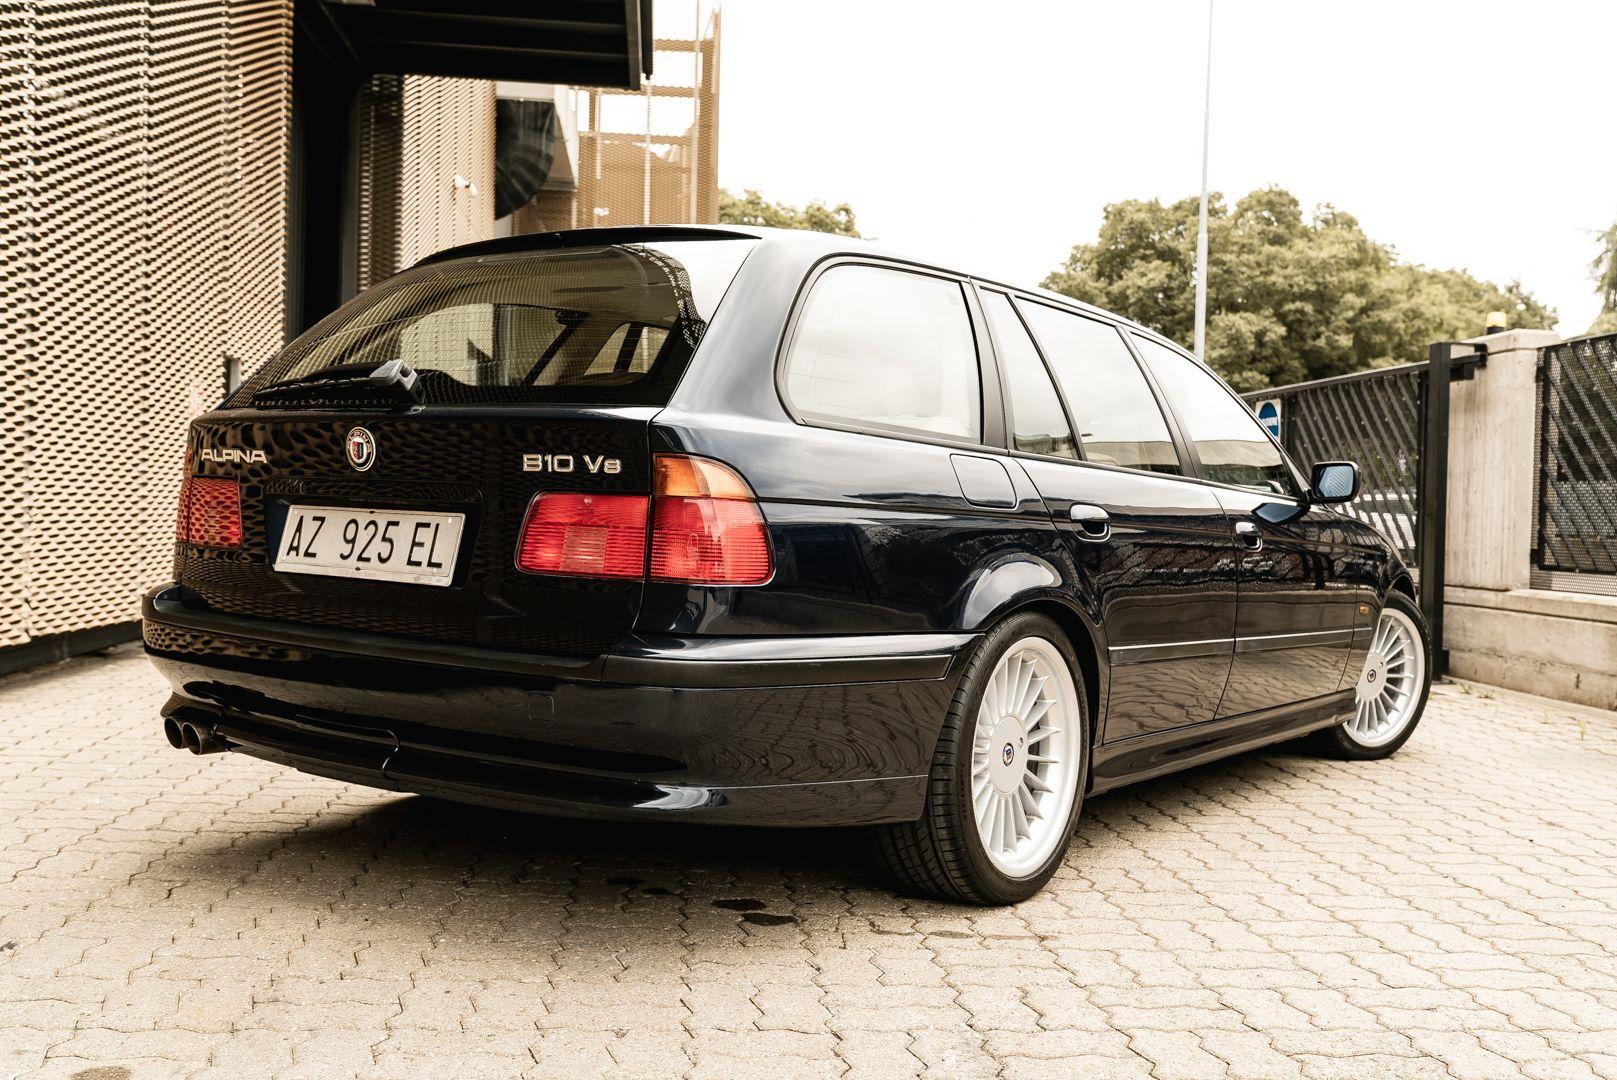 1998 BMW Alpina B10 Touring V8 82/204 78167